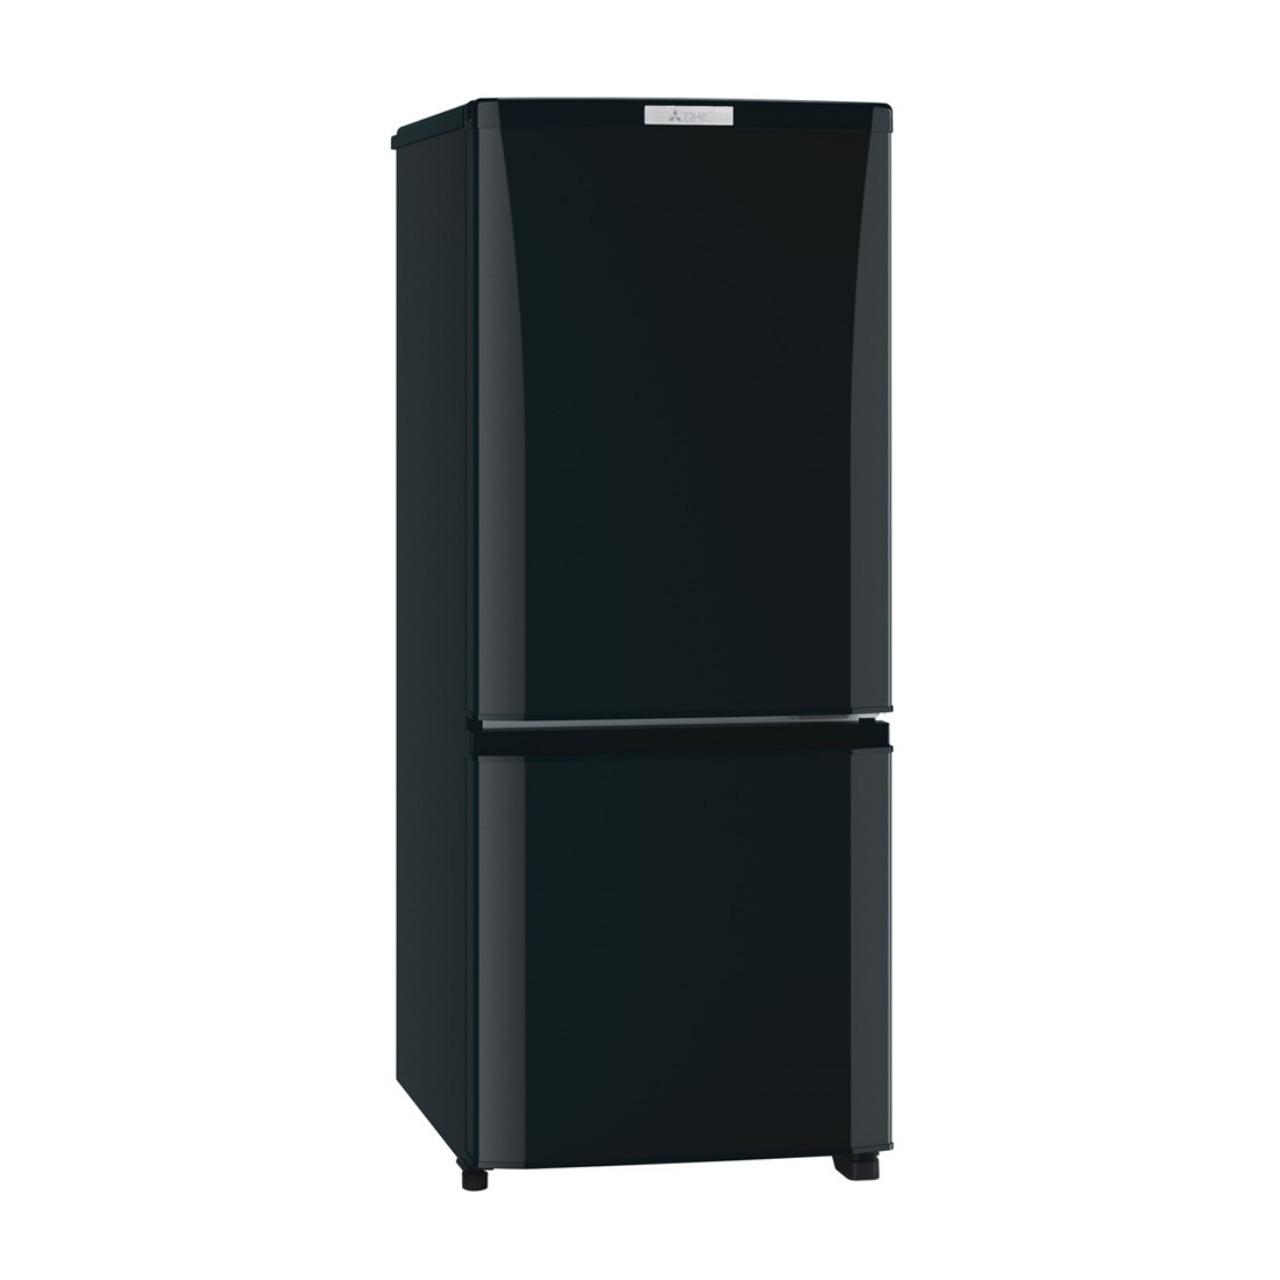 三菱MR-P15C冷蔵庫